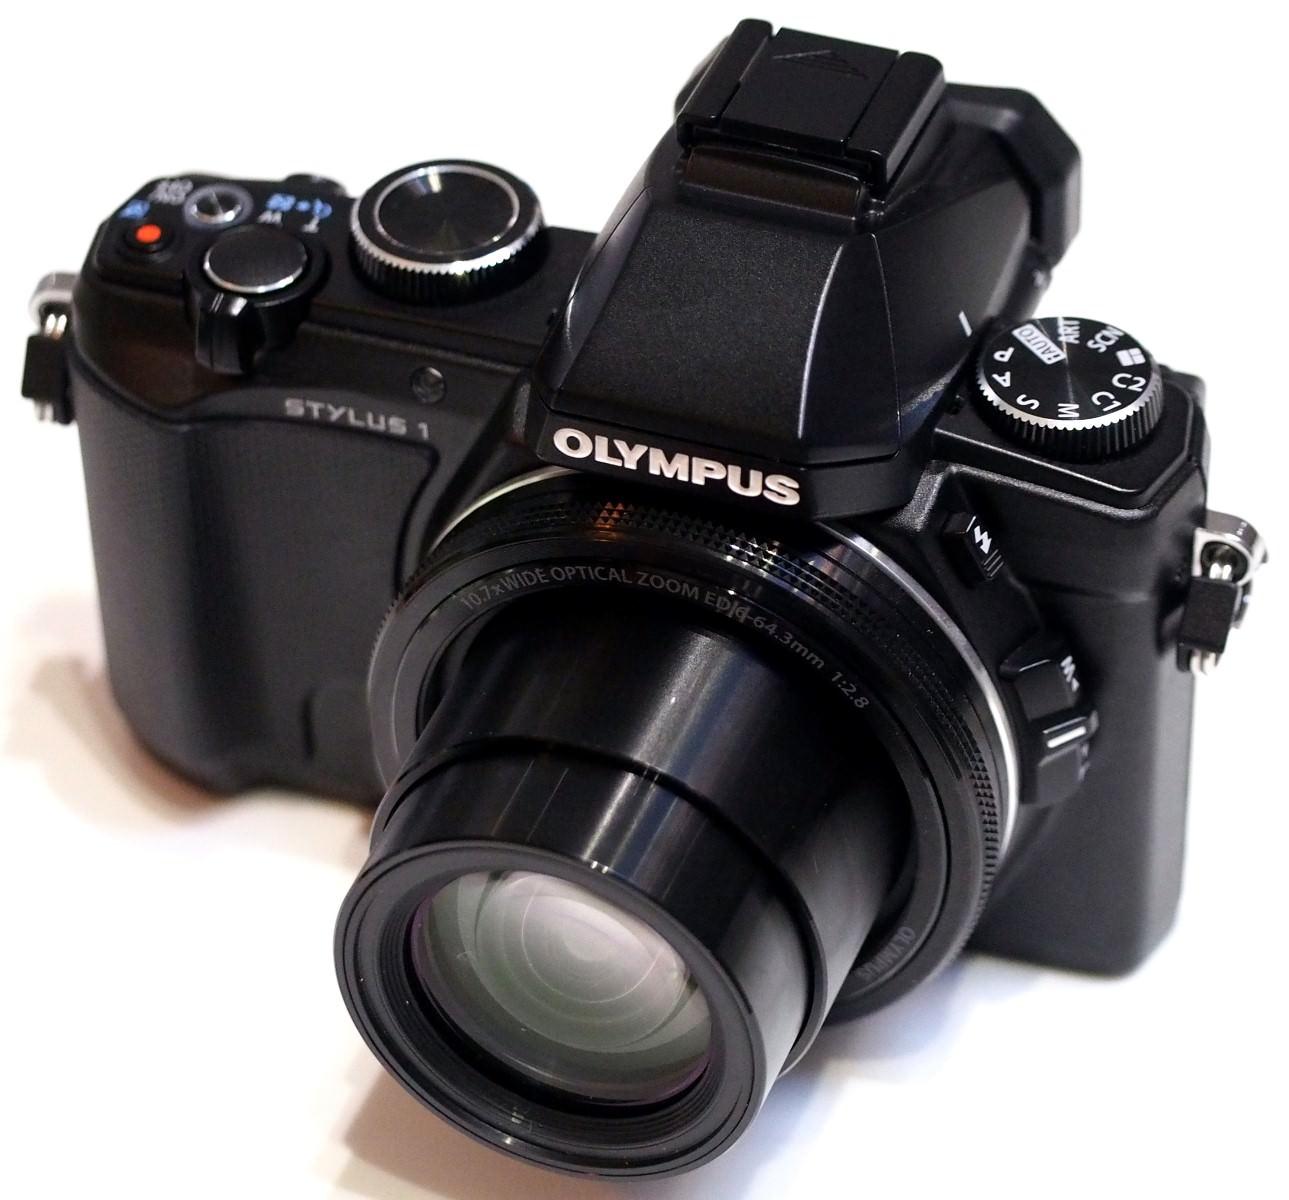 Olympus Stylus 1 sensor review - DxOMark